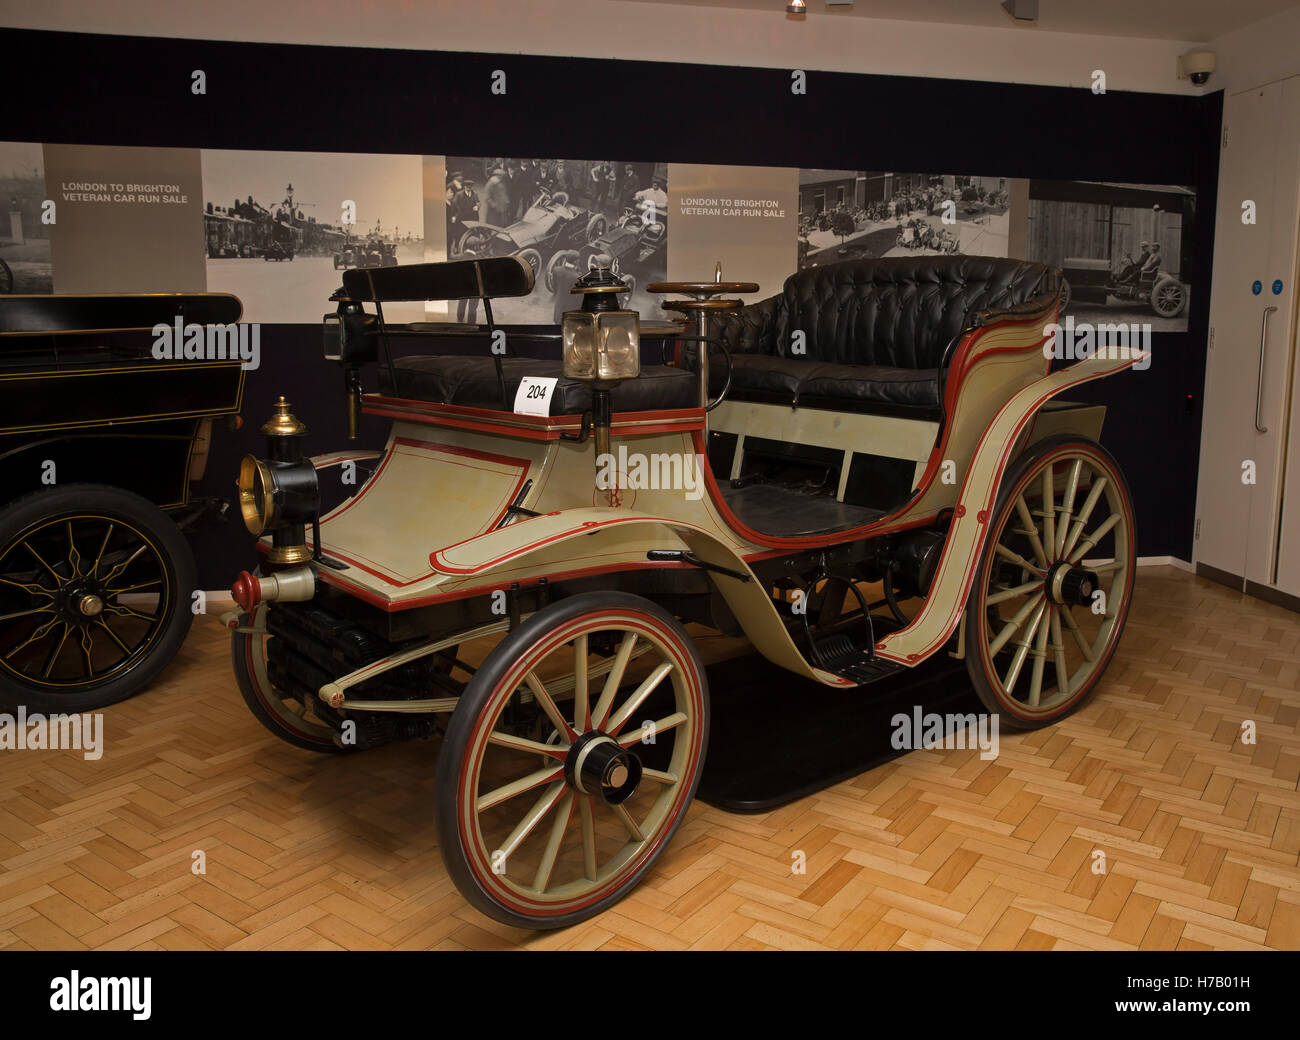 London, UK. 3rd Nov, 2016. 1896 RAYNAUD 8HP on display during Press ...